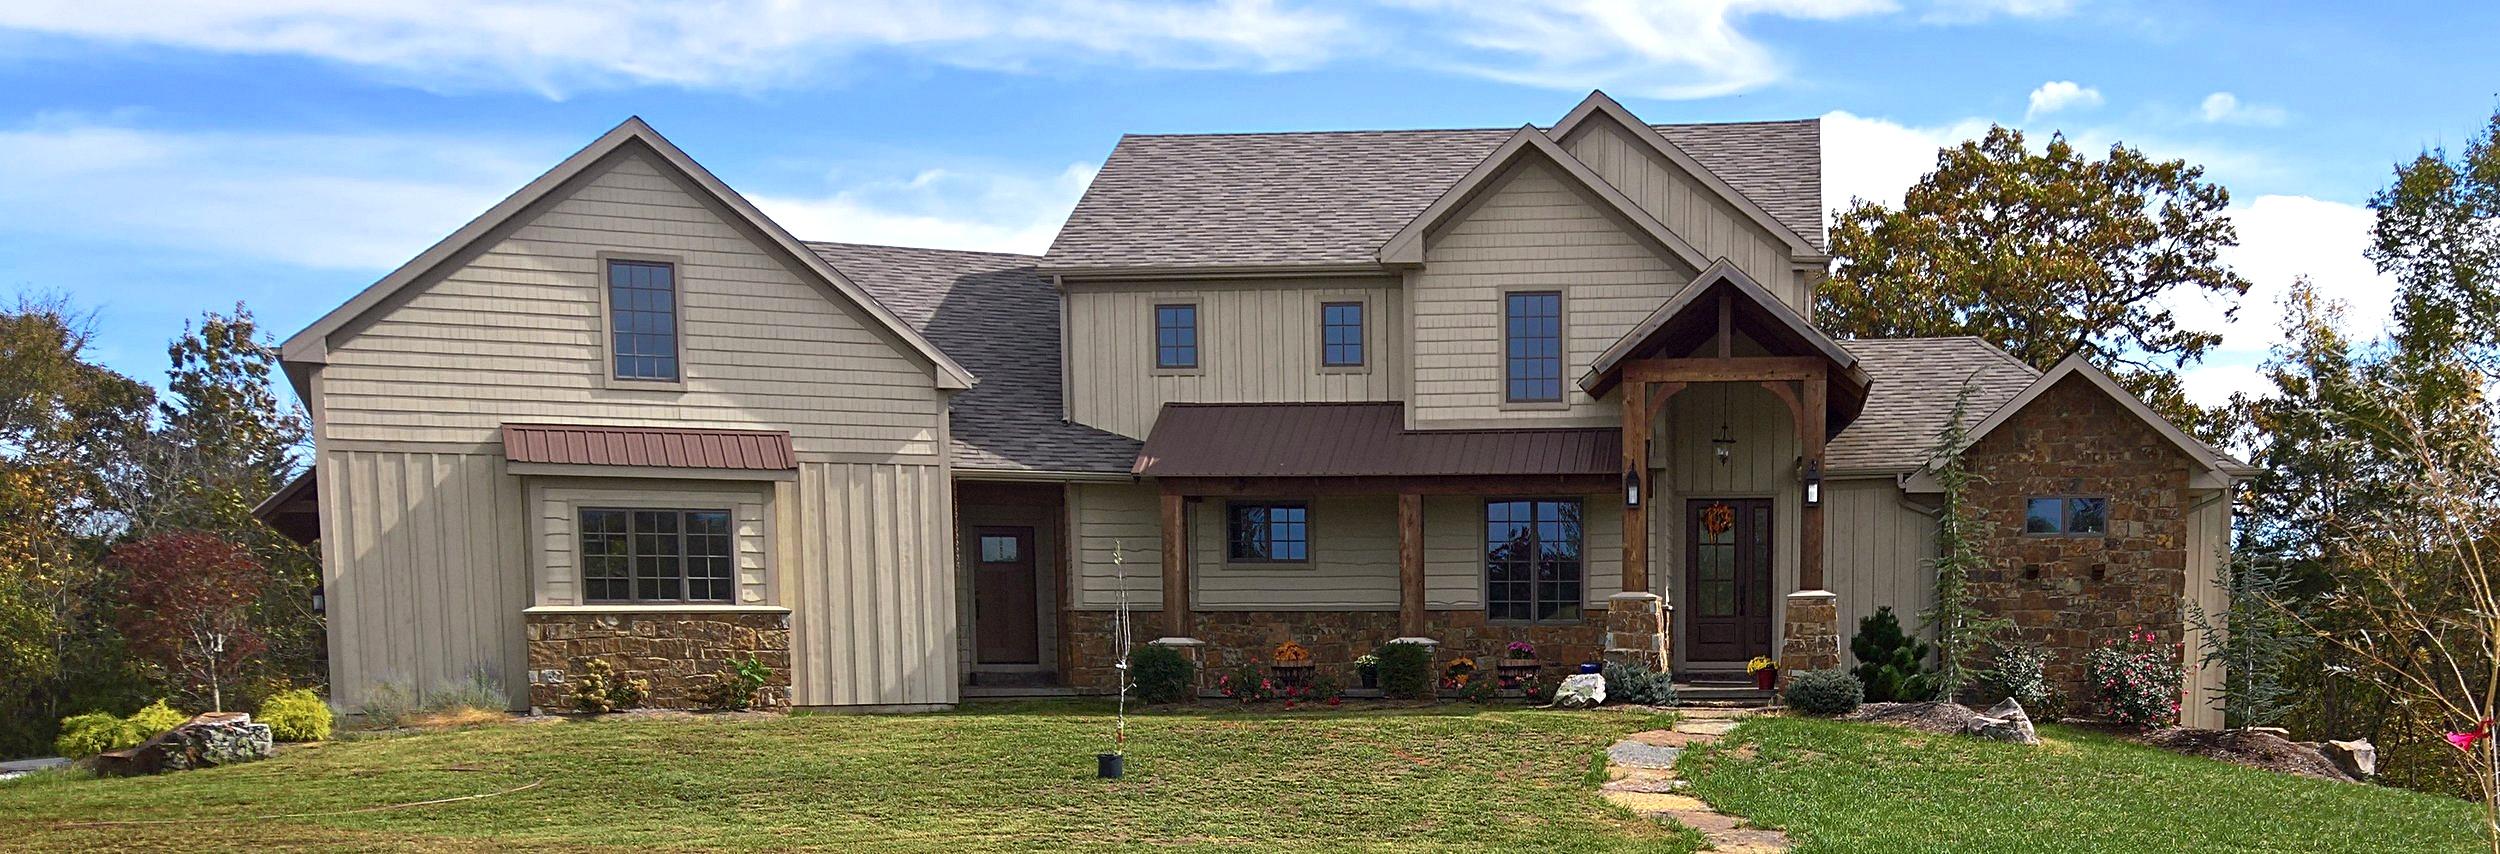 Testimonials — Dale Peer - Home Design, Inc.